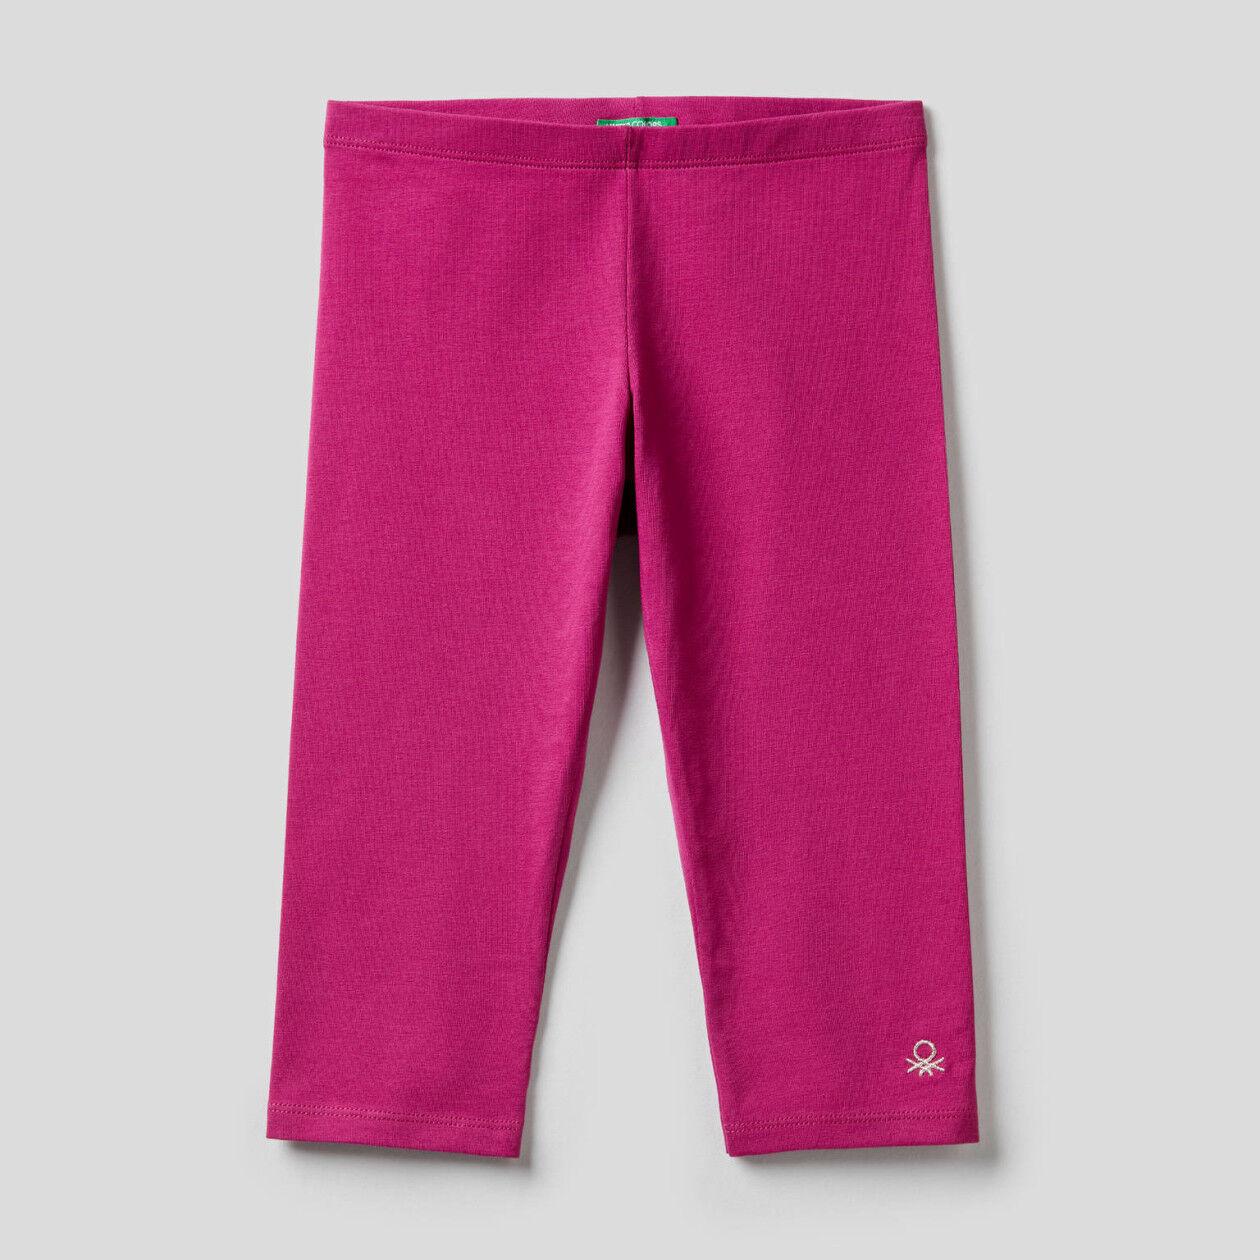 3/4-Leggings aus stretchiger Baumwolle